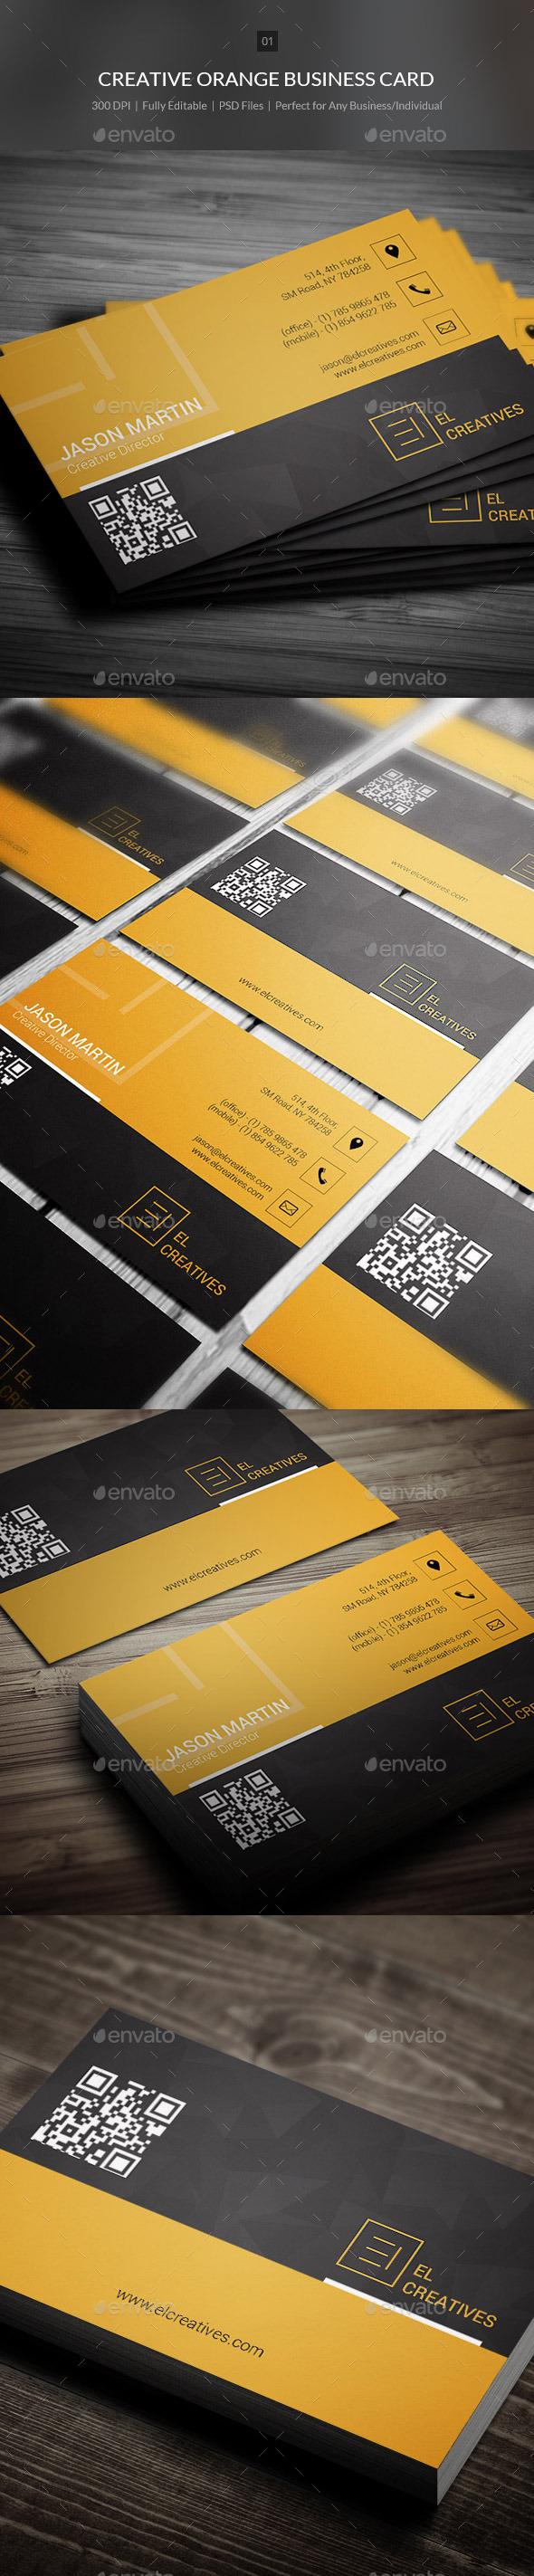 Creative Orange Business Card - 01 - Creative Business Cards